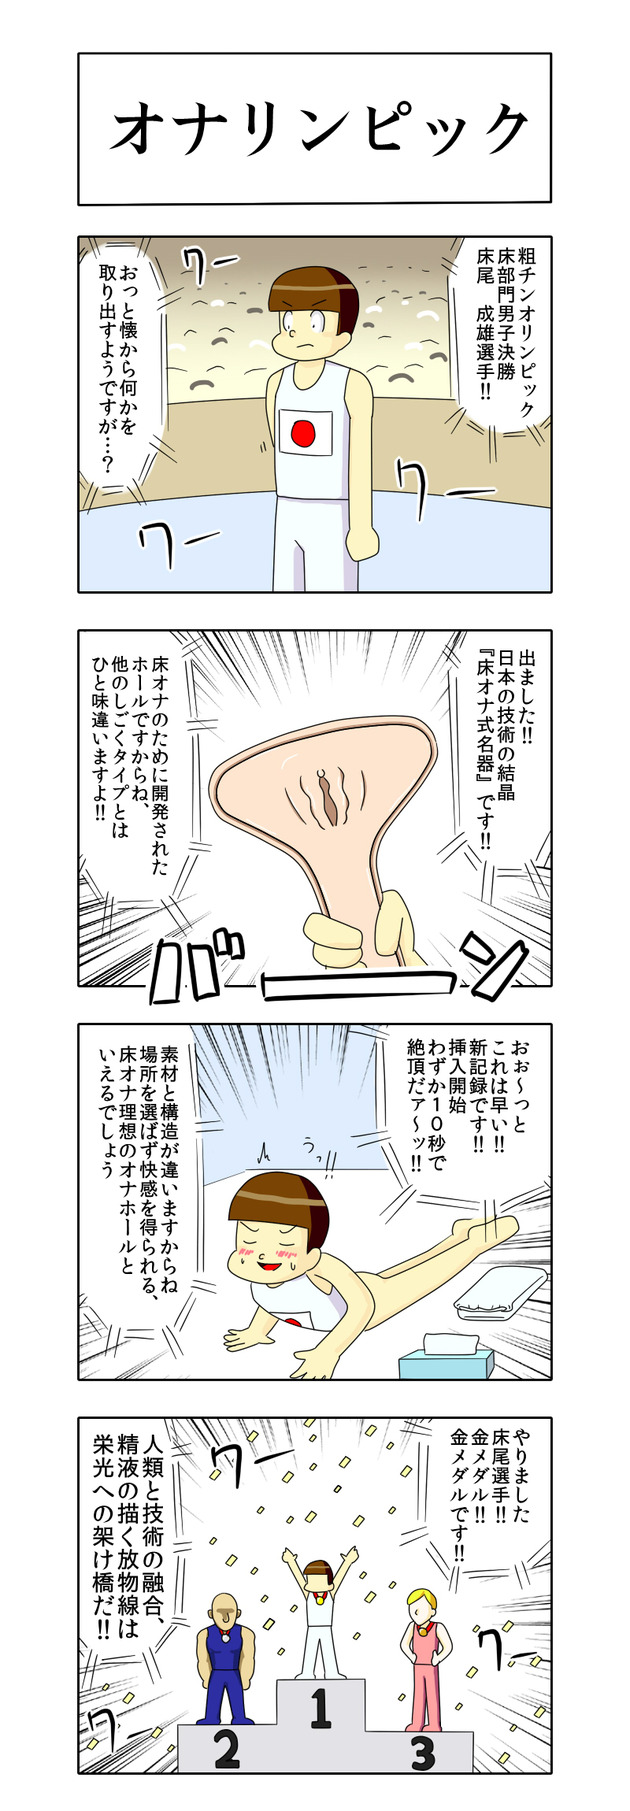 yukaona04_onarinpic